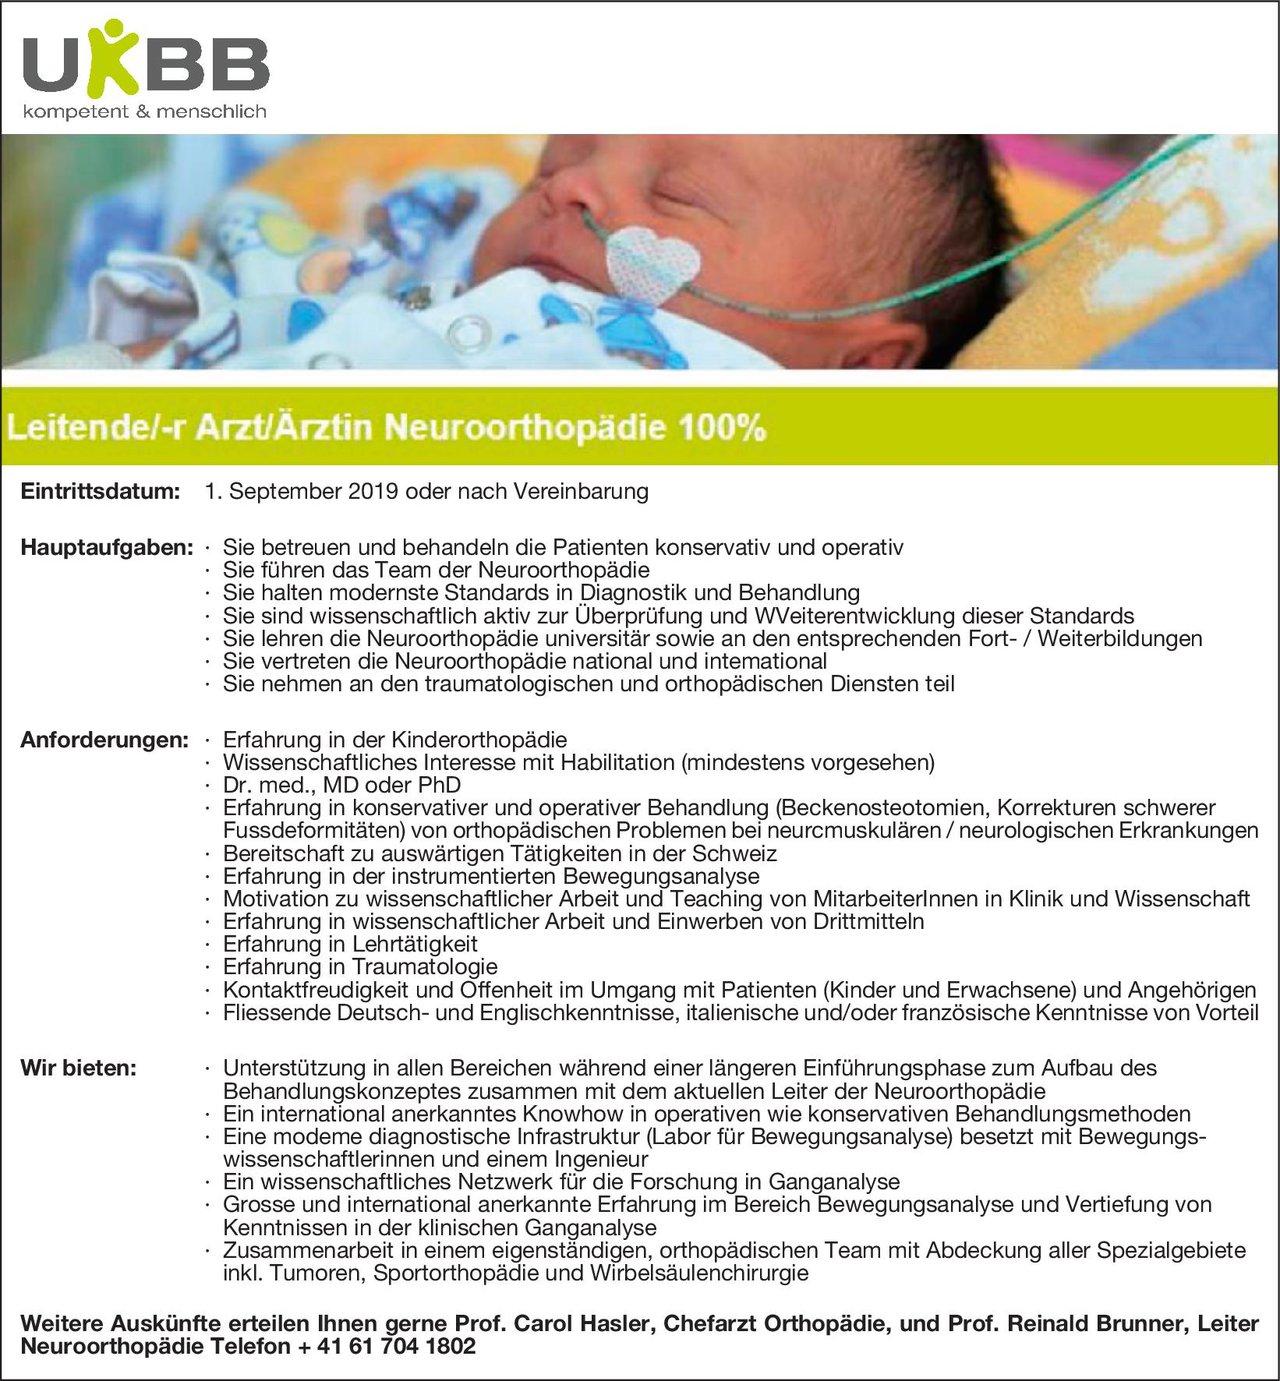 UKBB - Universitäts-Kinderspital Leitende/-r Arzt/Ärztin Neuroorthopädie 100%  Orthopädie und Unfallchirurgie, Chirurgie, Neurologie Ärztl. Leiter